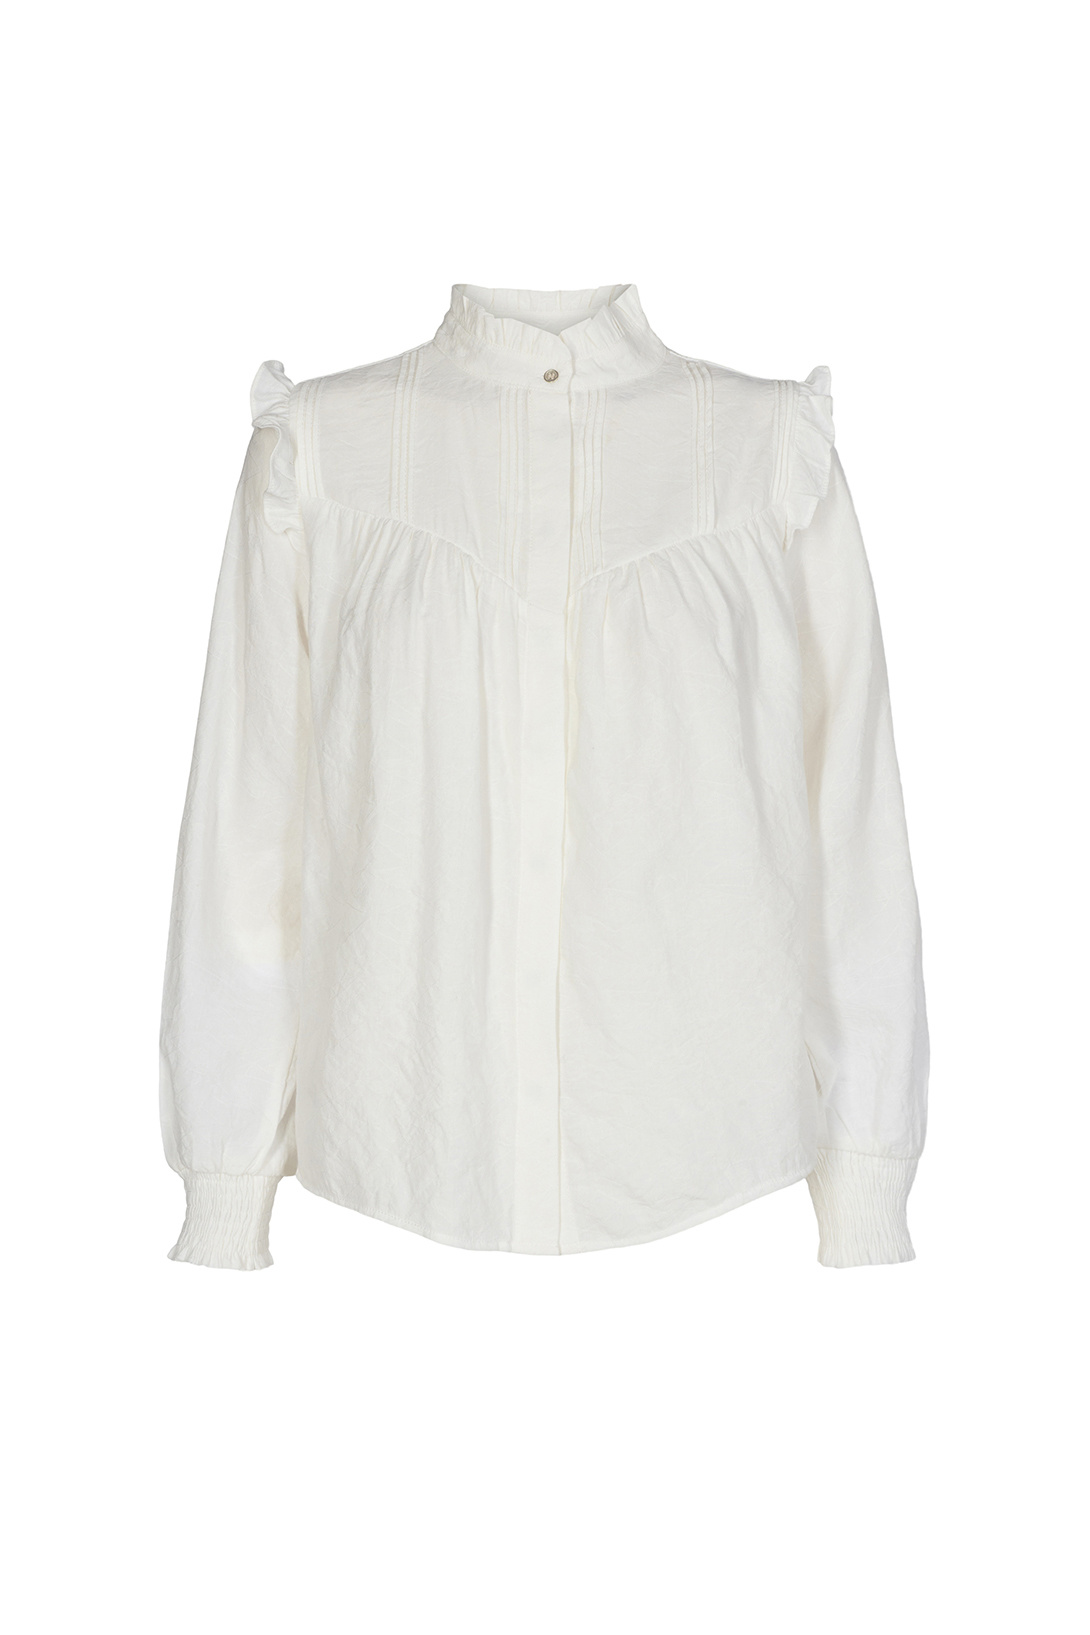 Mason Shirt - Gebroken Wit-1